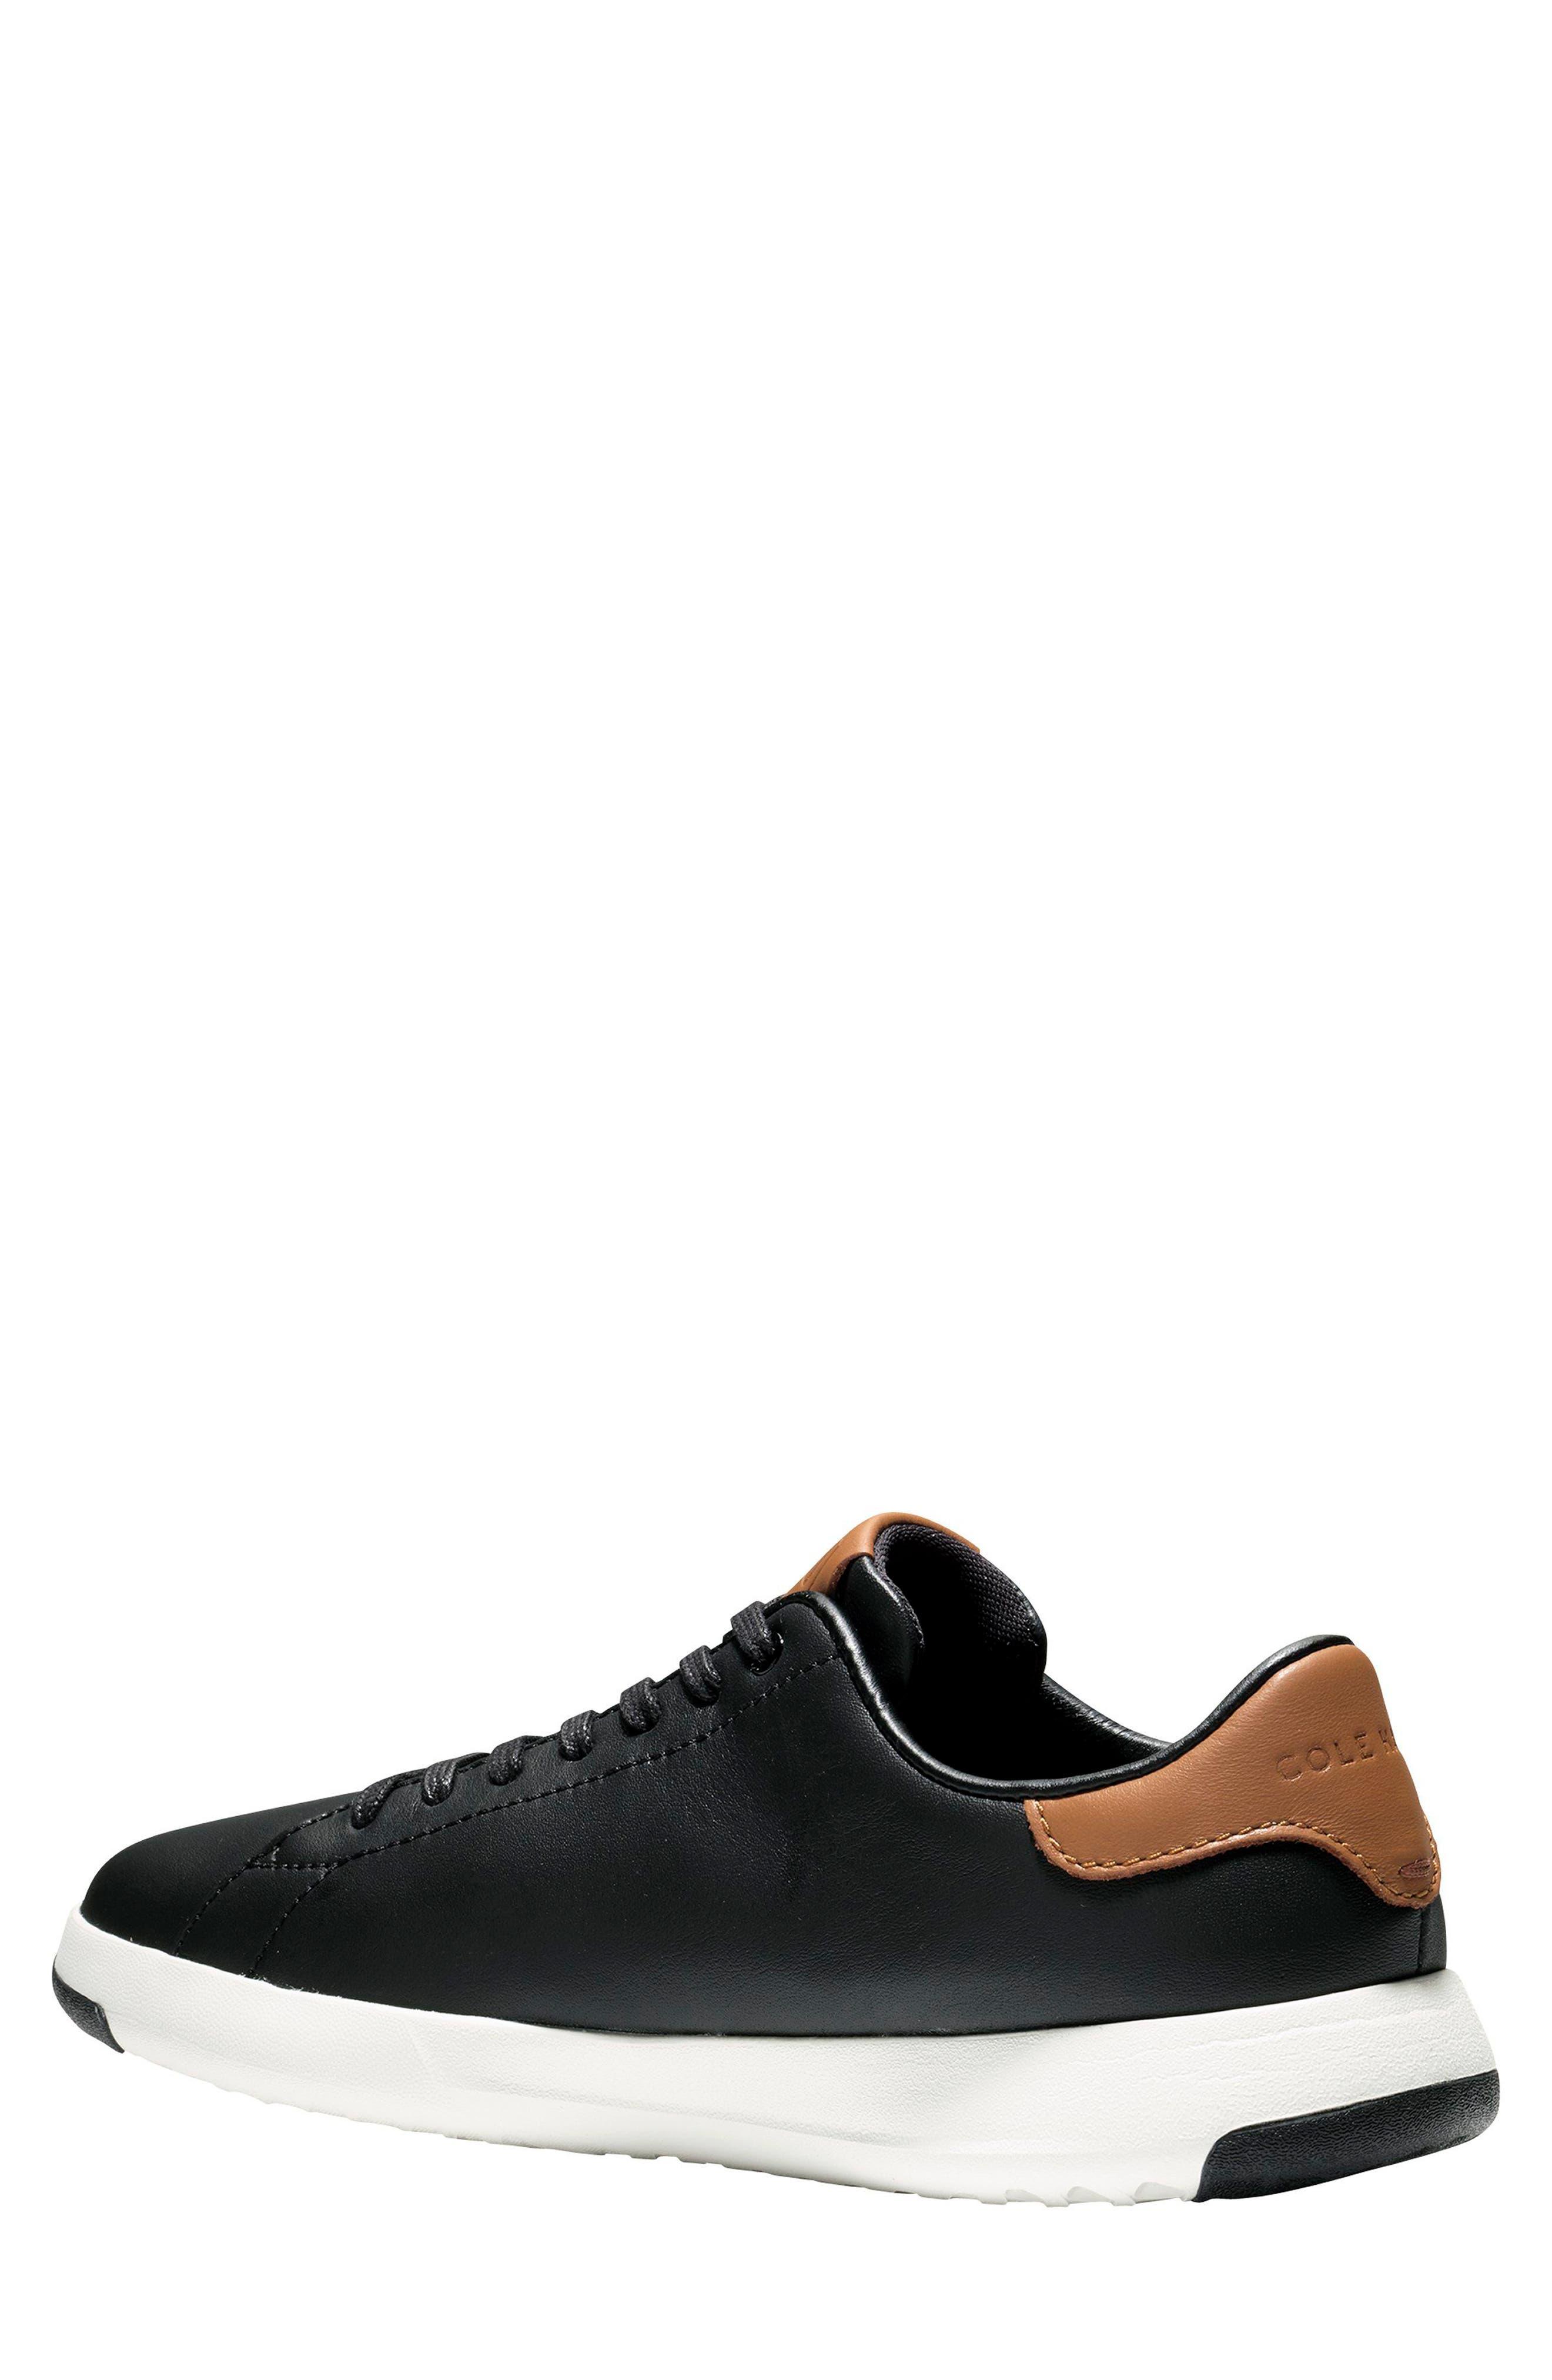 GrandPro Tennis Sneaker,                             Alternate thumbnail 2, color,                             BLACK/ BRITISH TAN